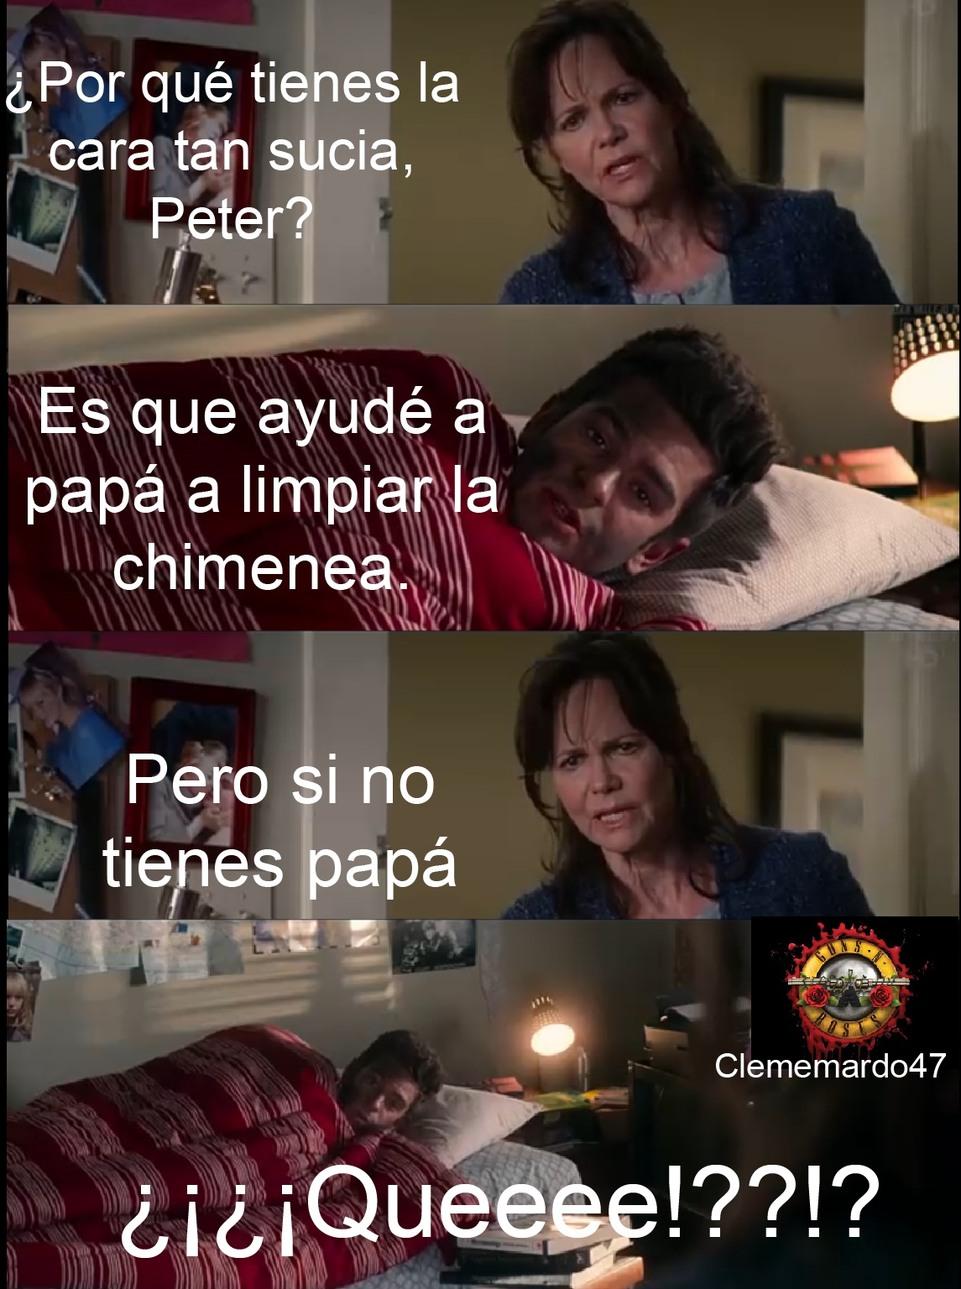 el huérfano Peter - meme